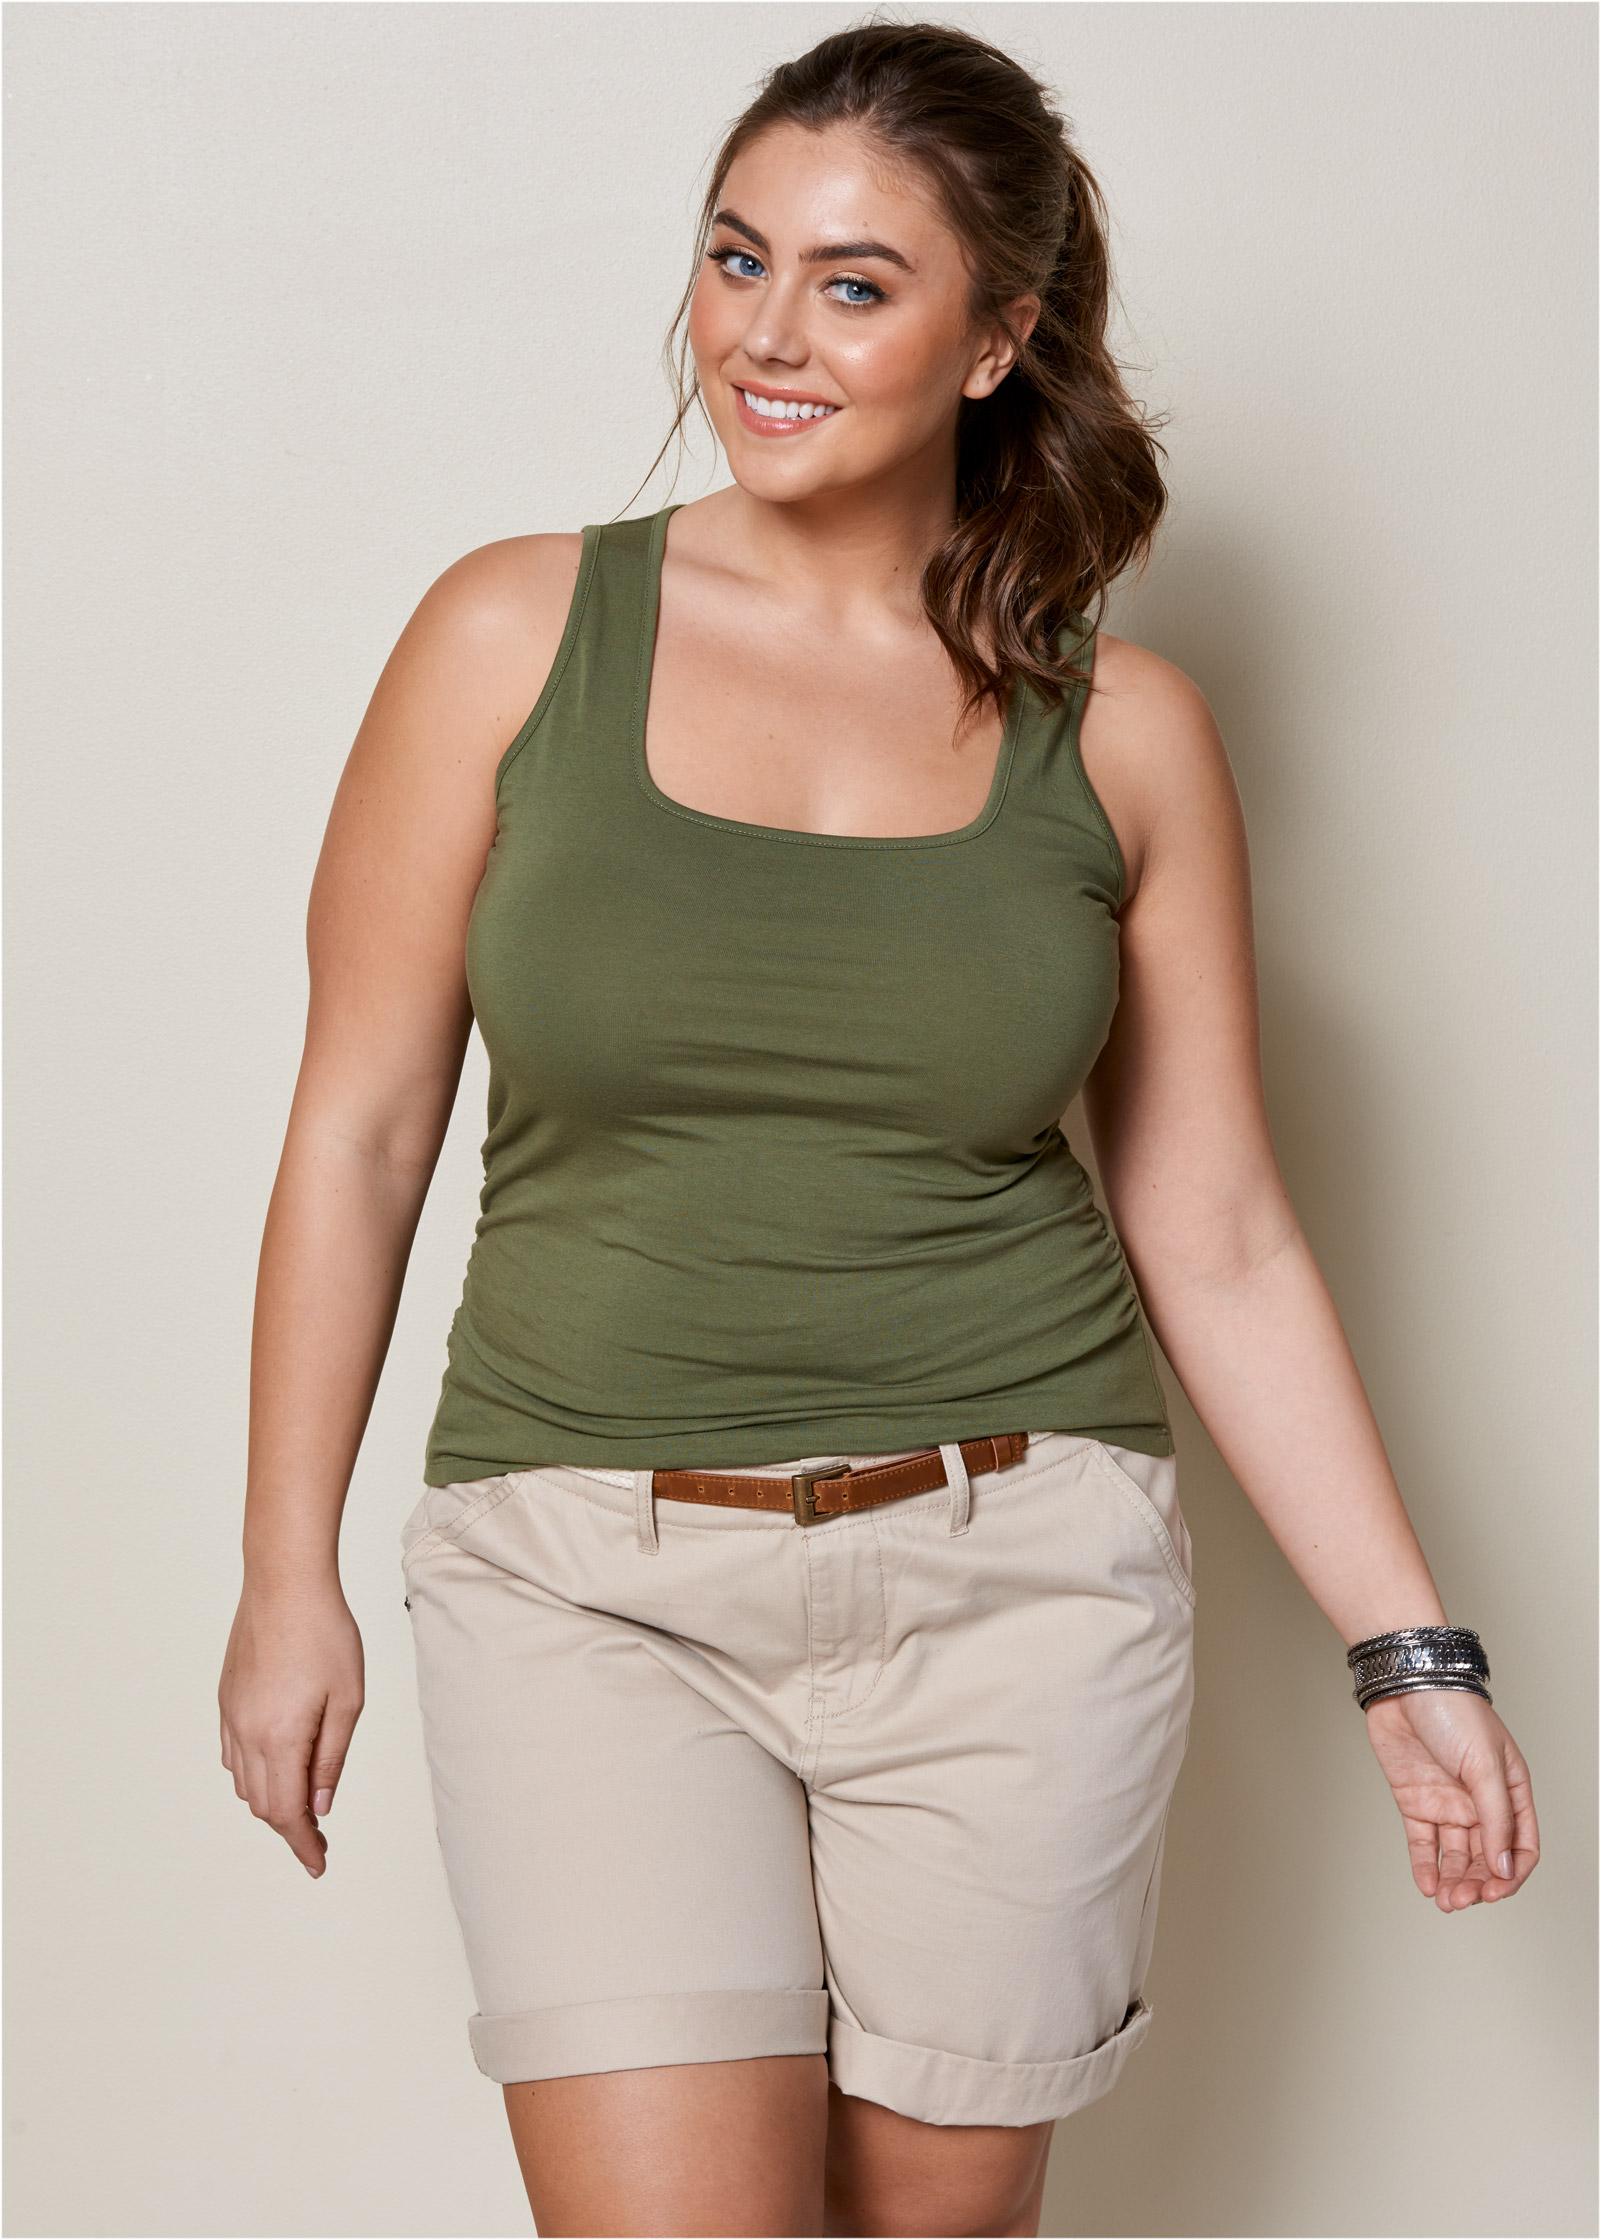 Plus Size Dressy Tank Tops